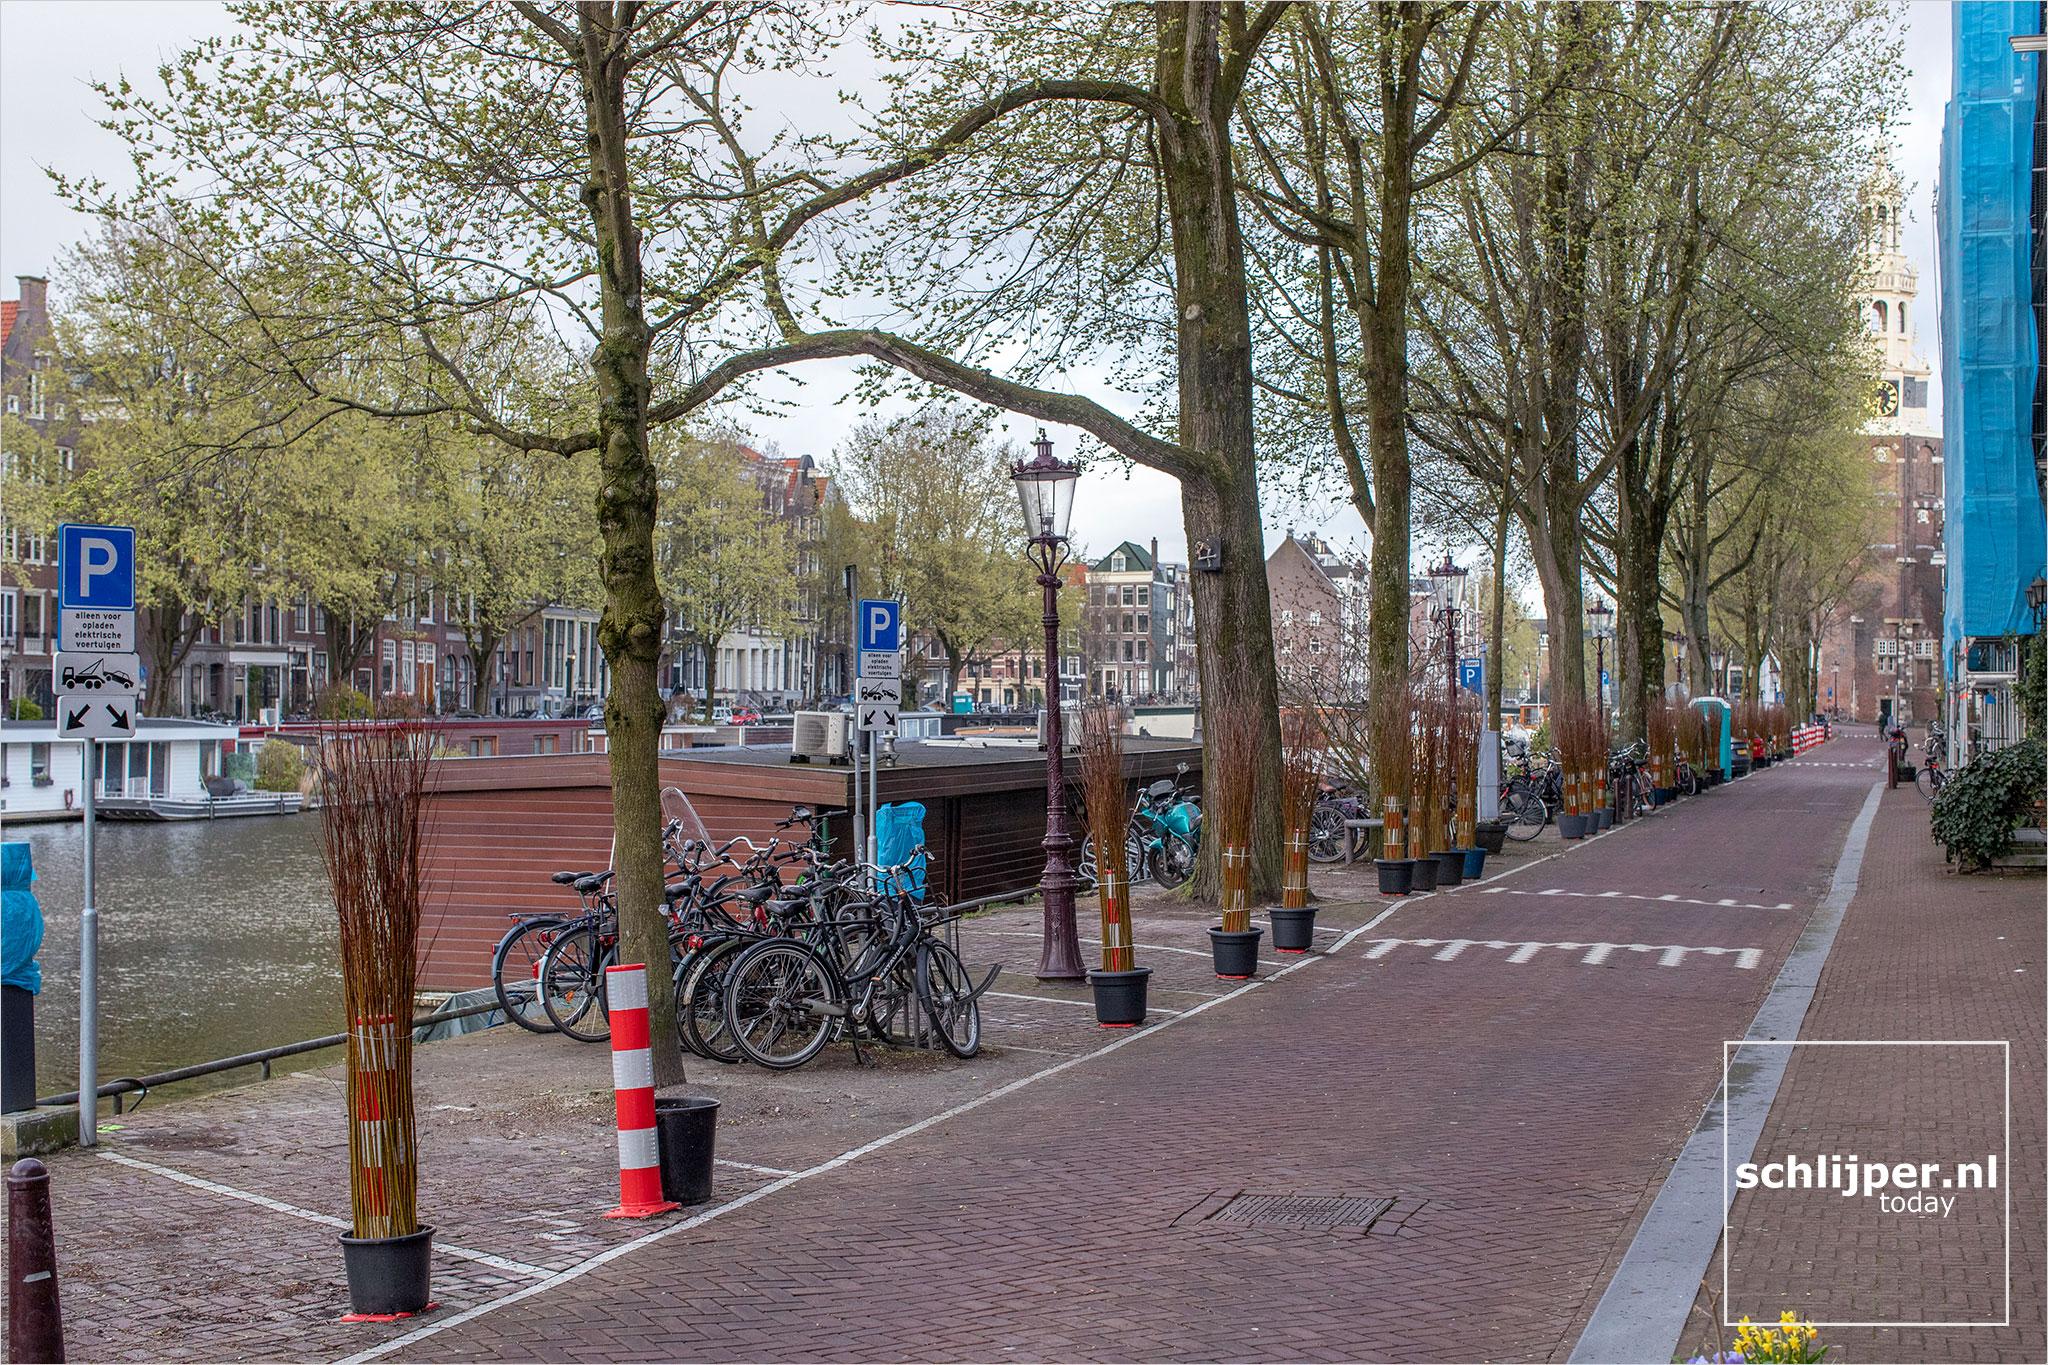 The Netherlands, Amsterdam, 7 april 2021